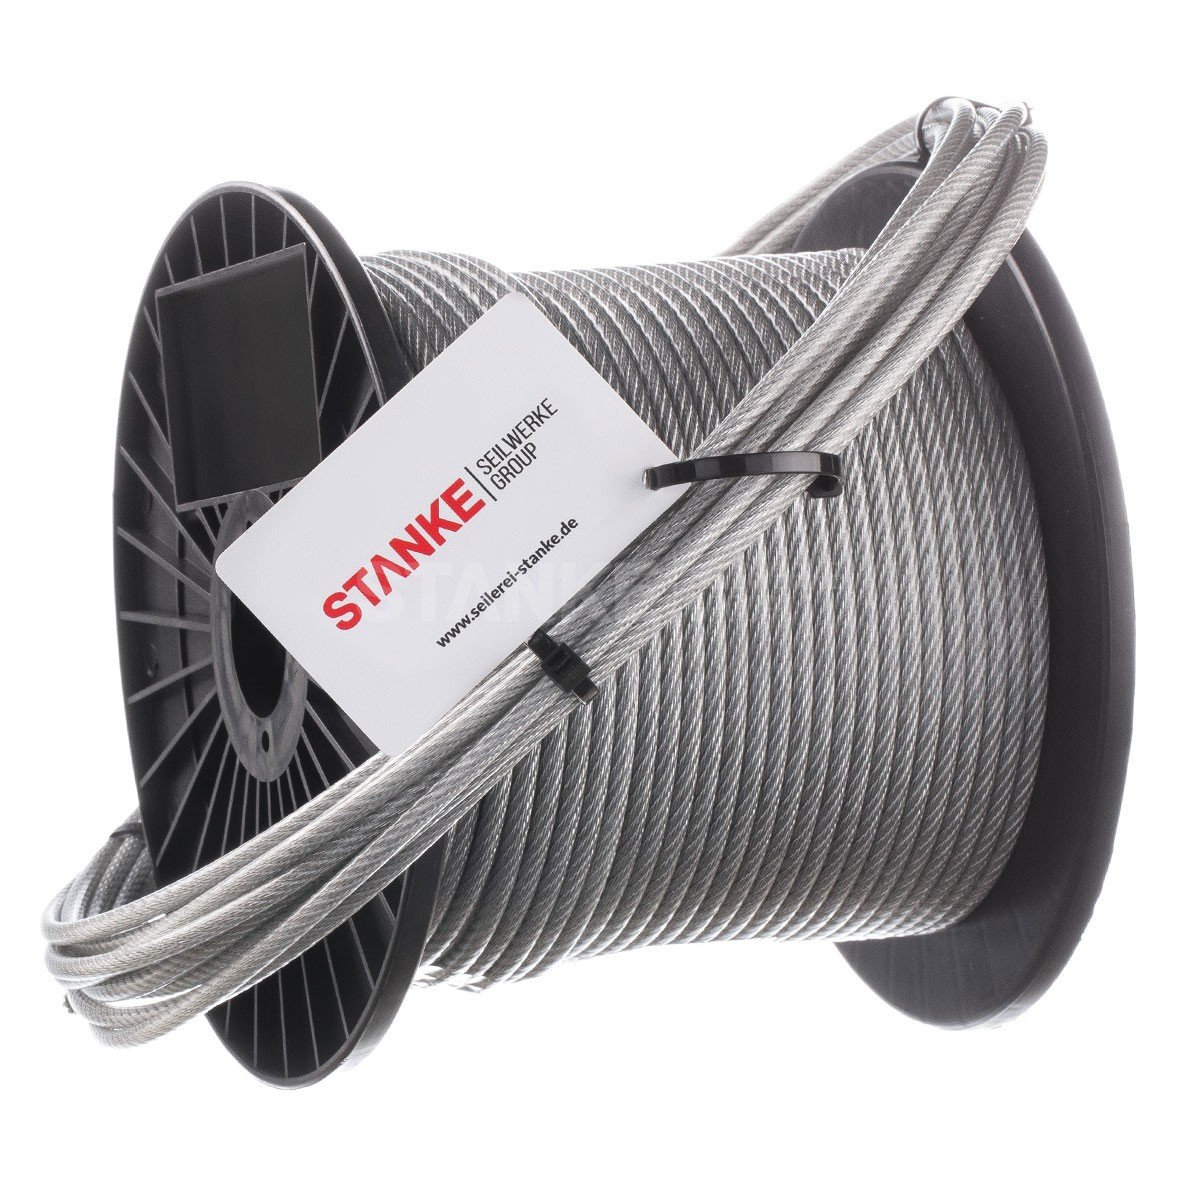 Stahlseil 3mm PVC ummantelt | Jumbo-Shop